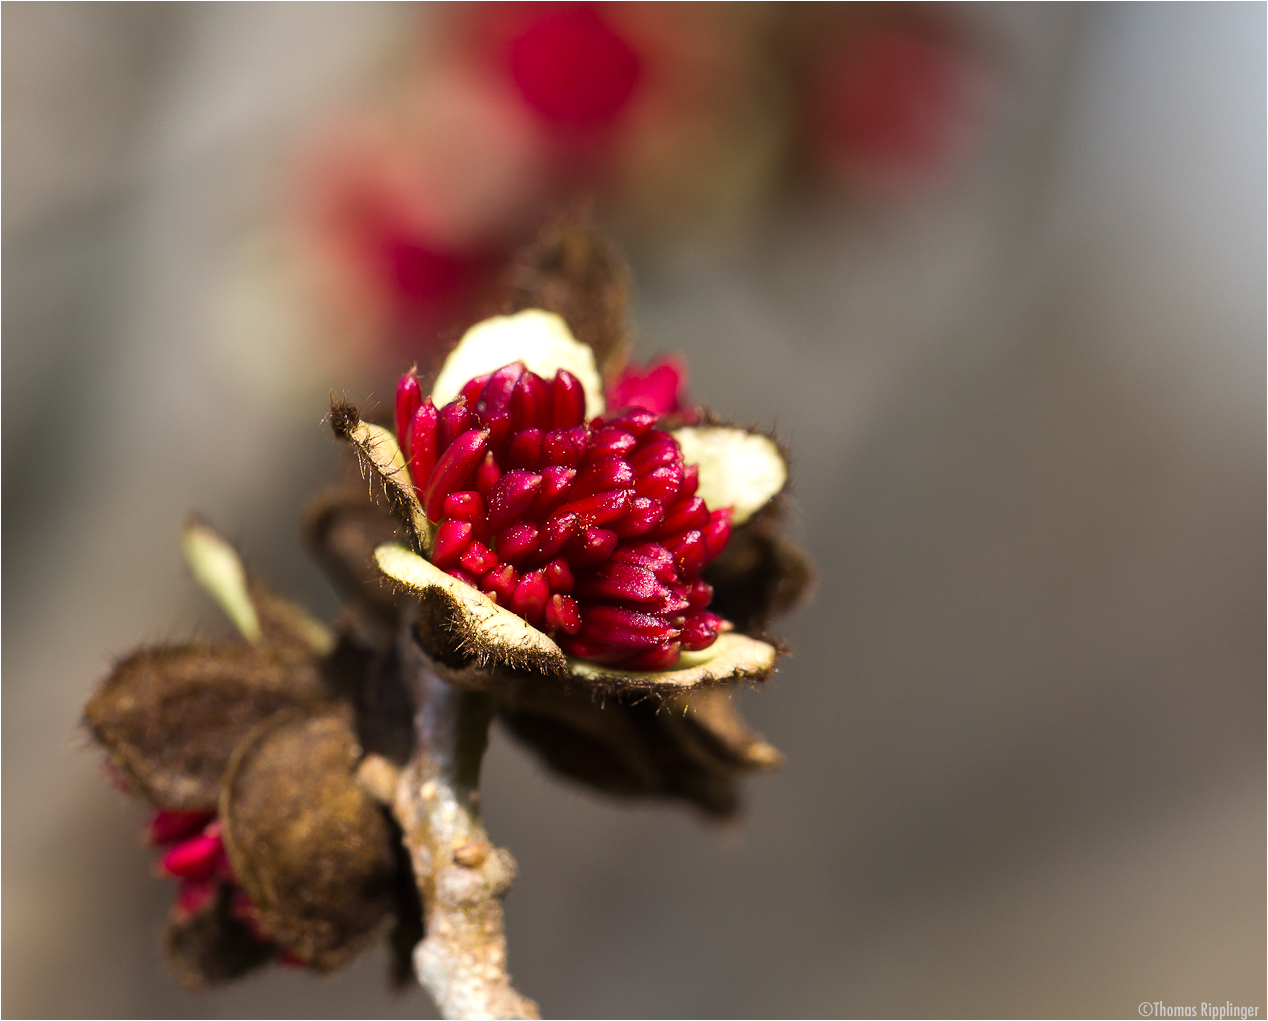 Persischer Eisenholzbaum (Parrotia persica).